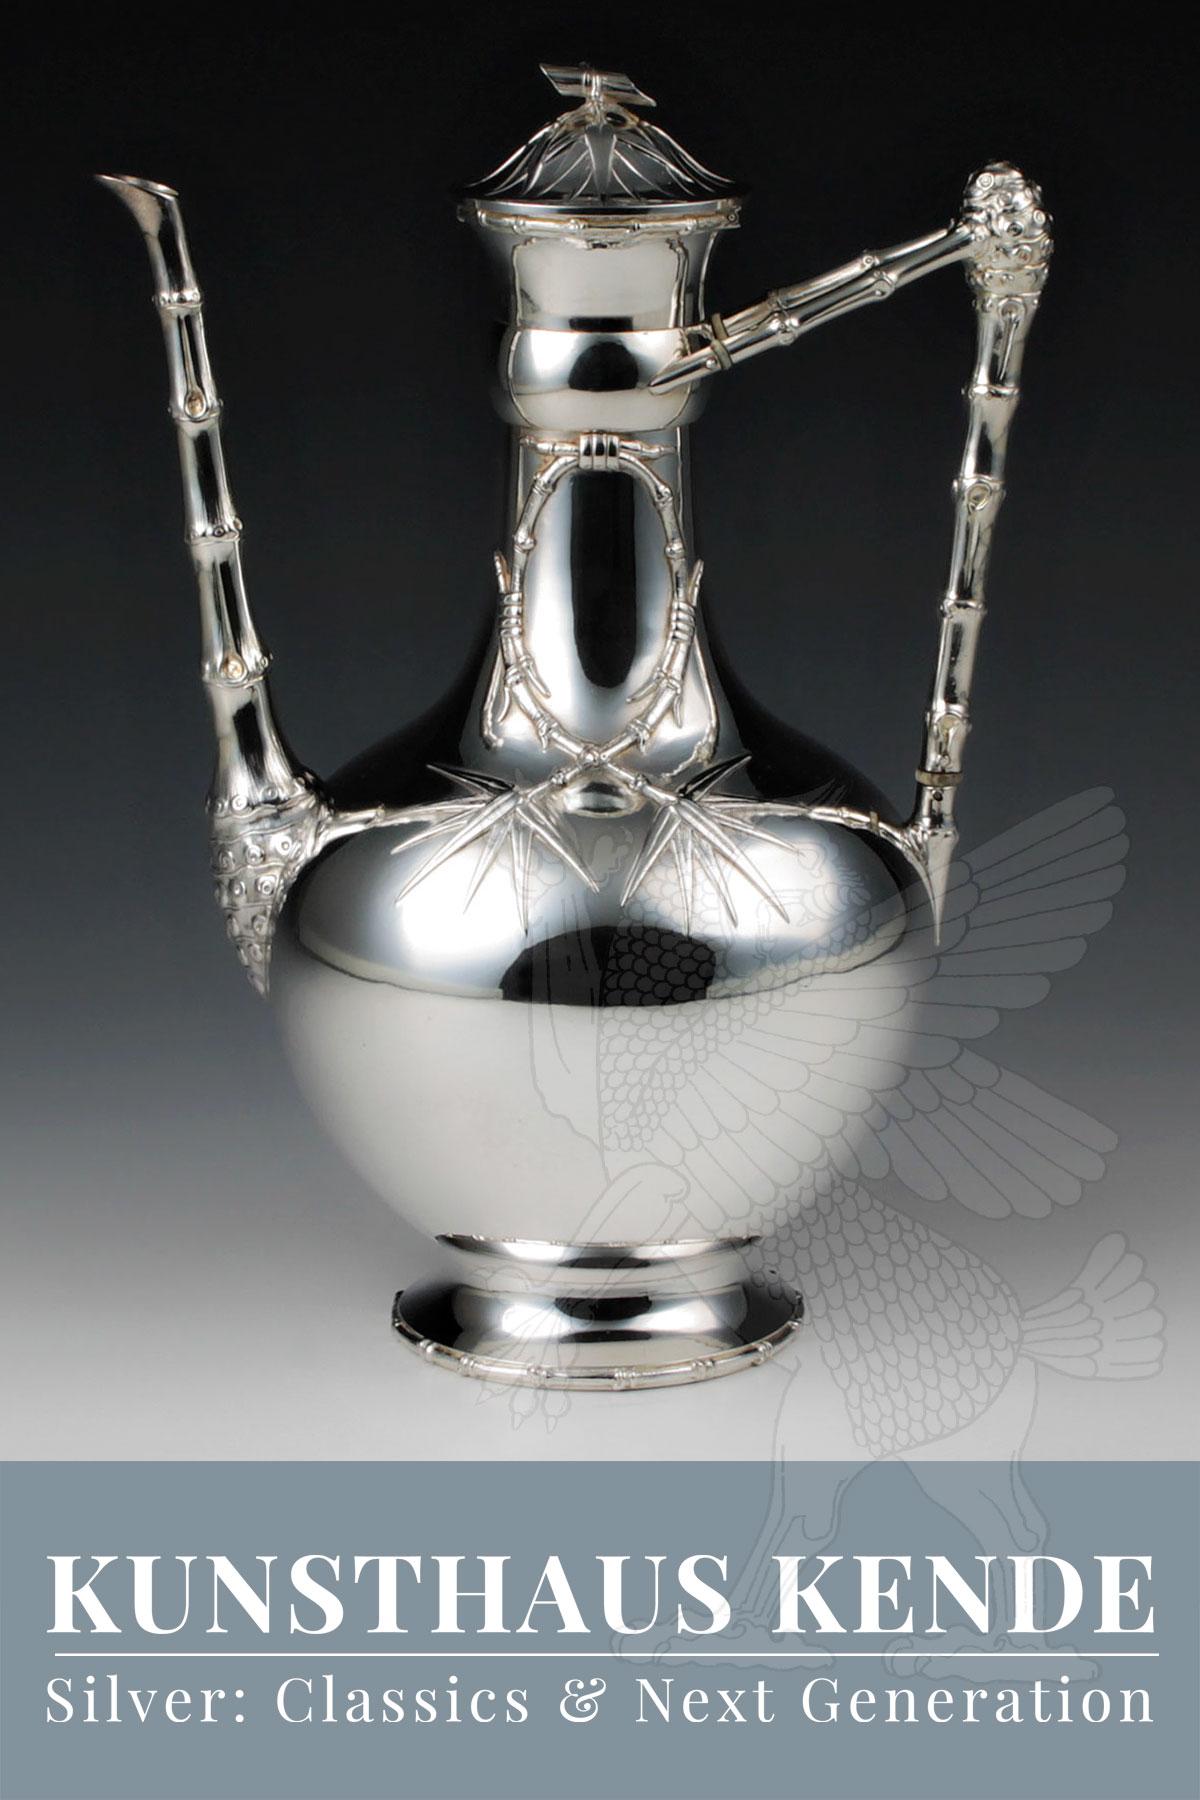 japanese aesthetic circa 1885 Aesthetic Movement sterling silver coffee biggin